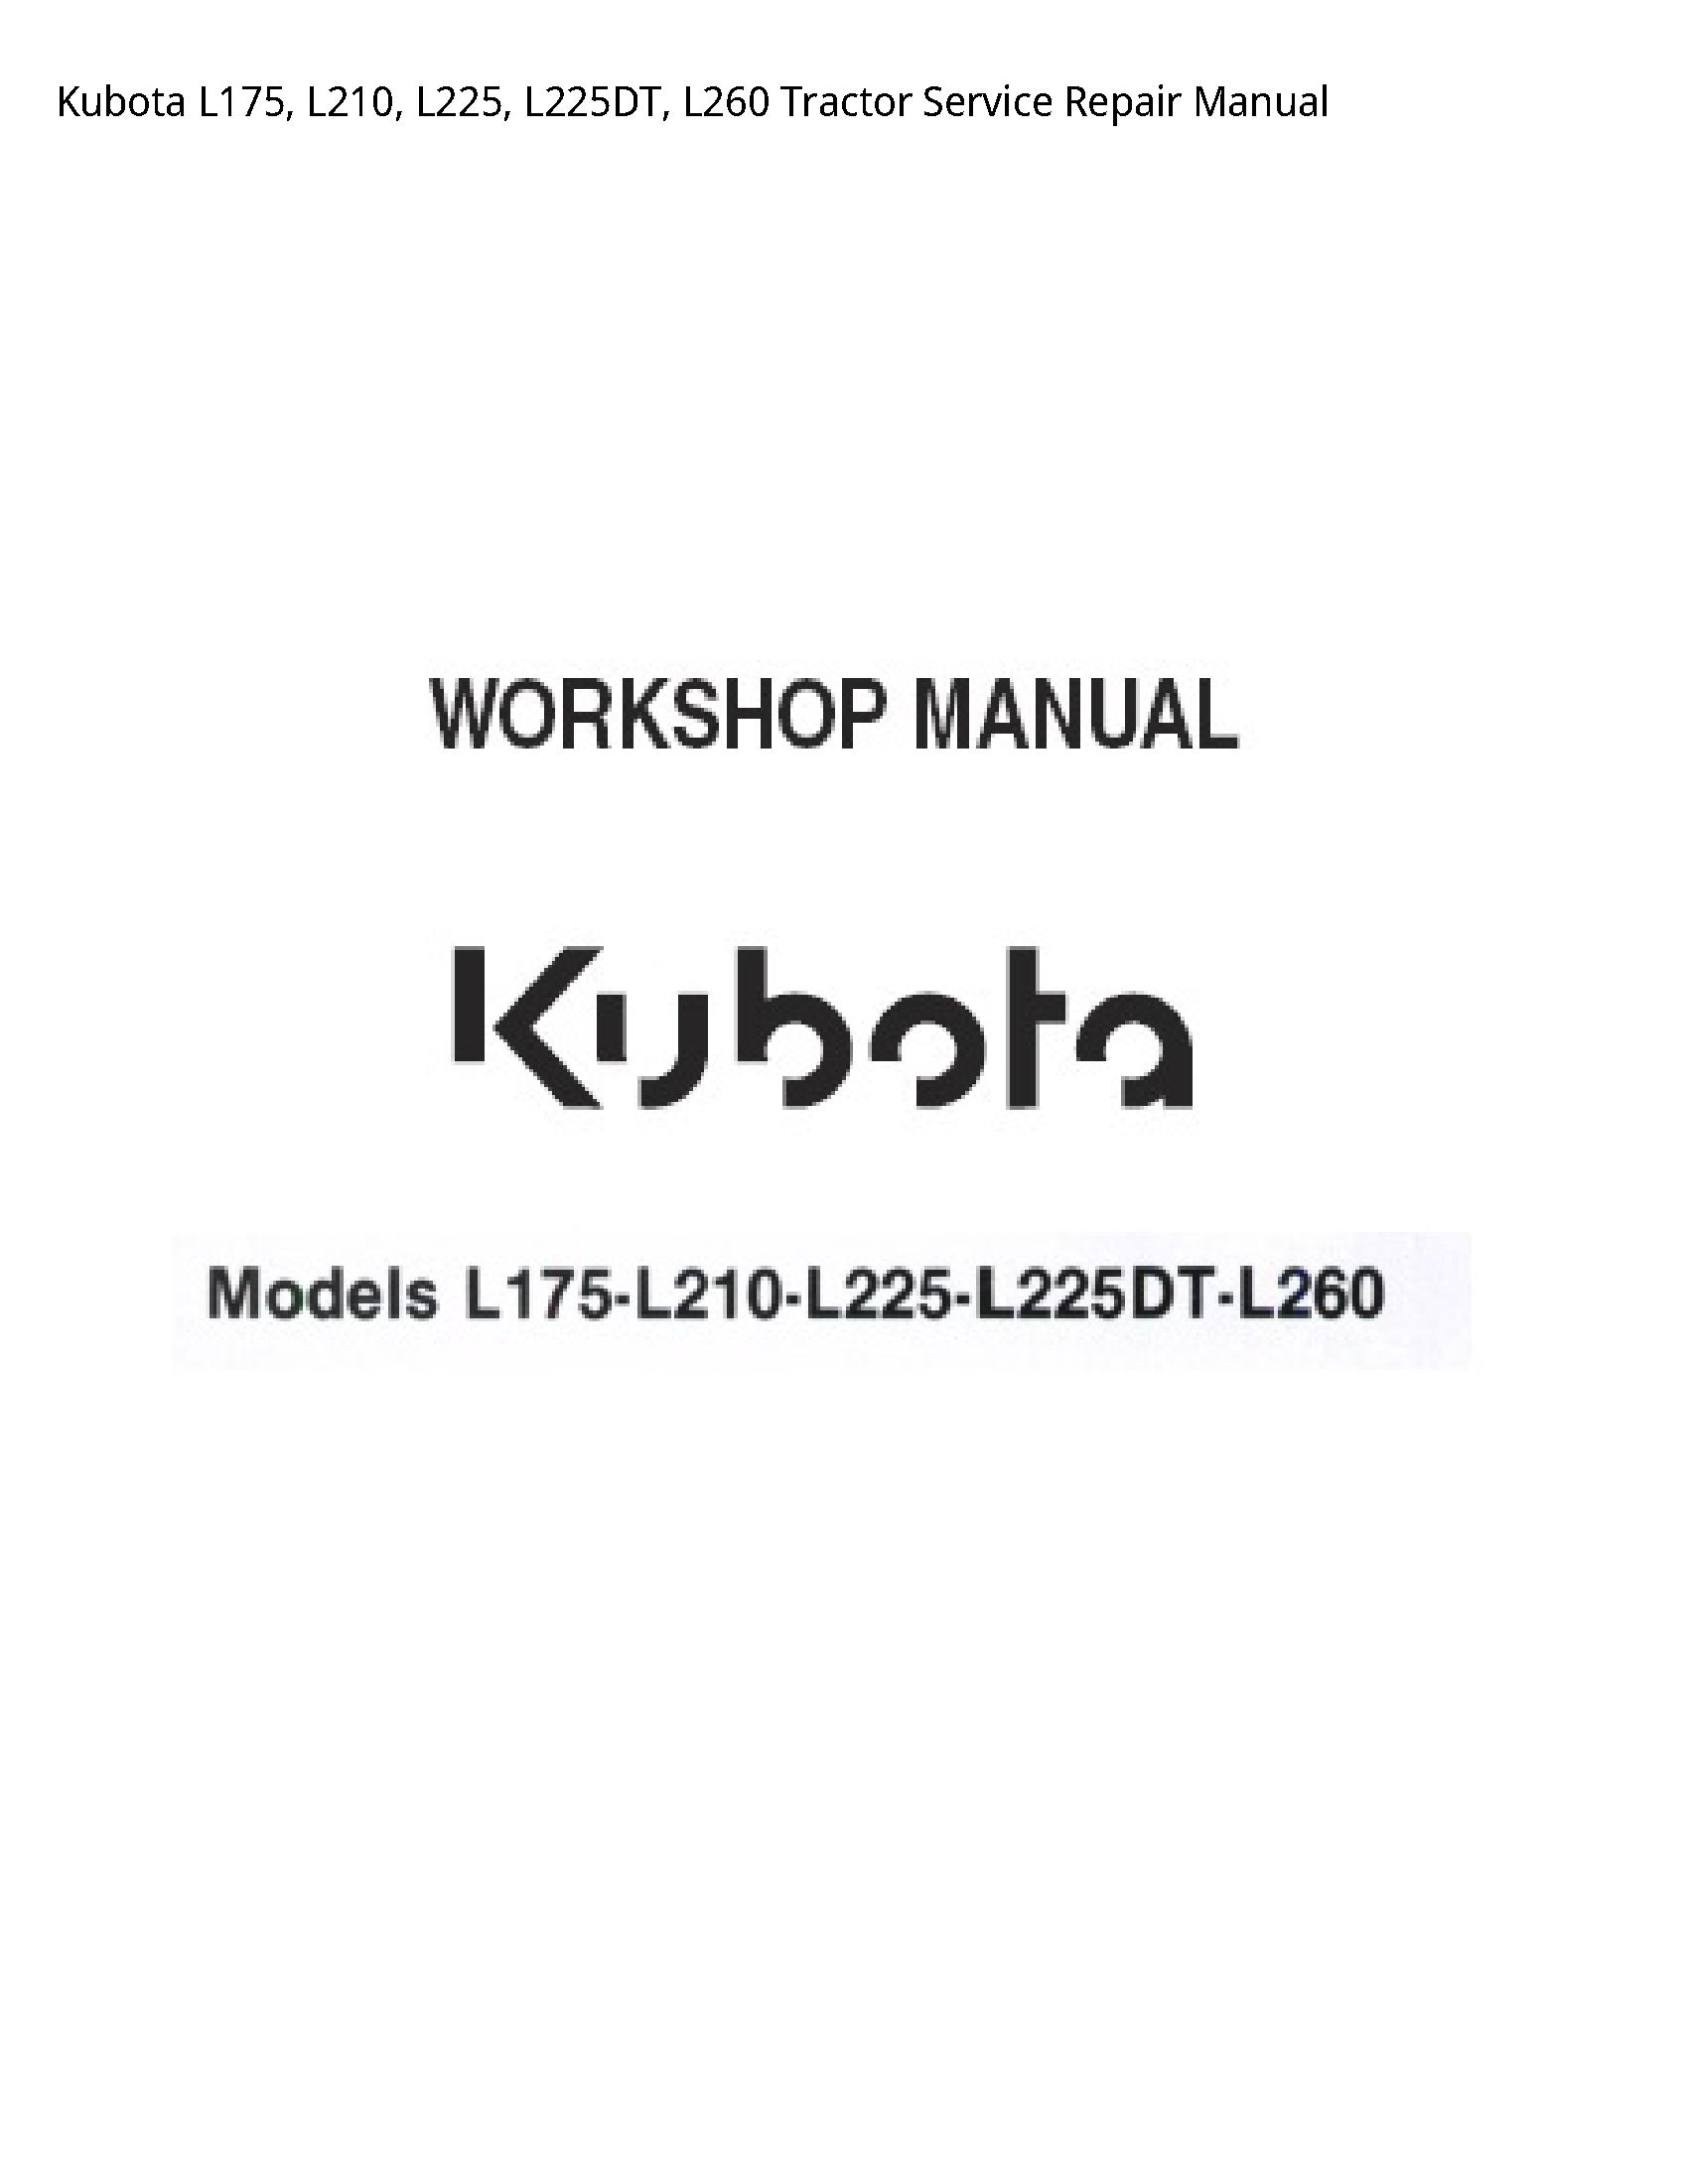 Kubota L175 Tractor manual